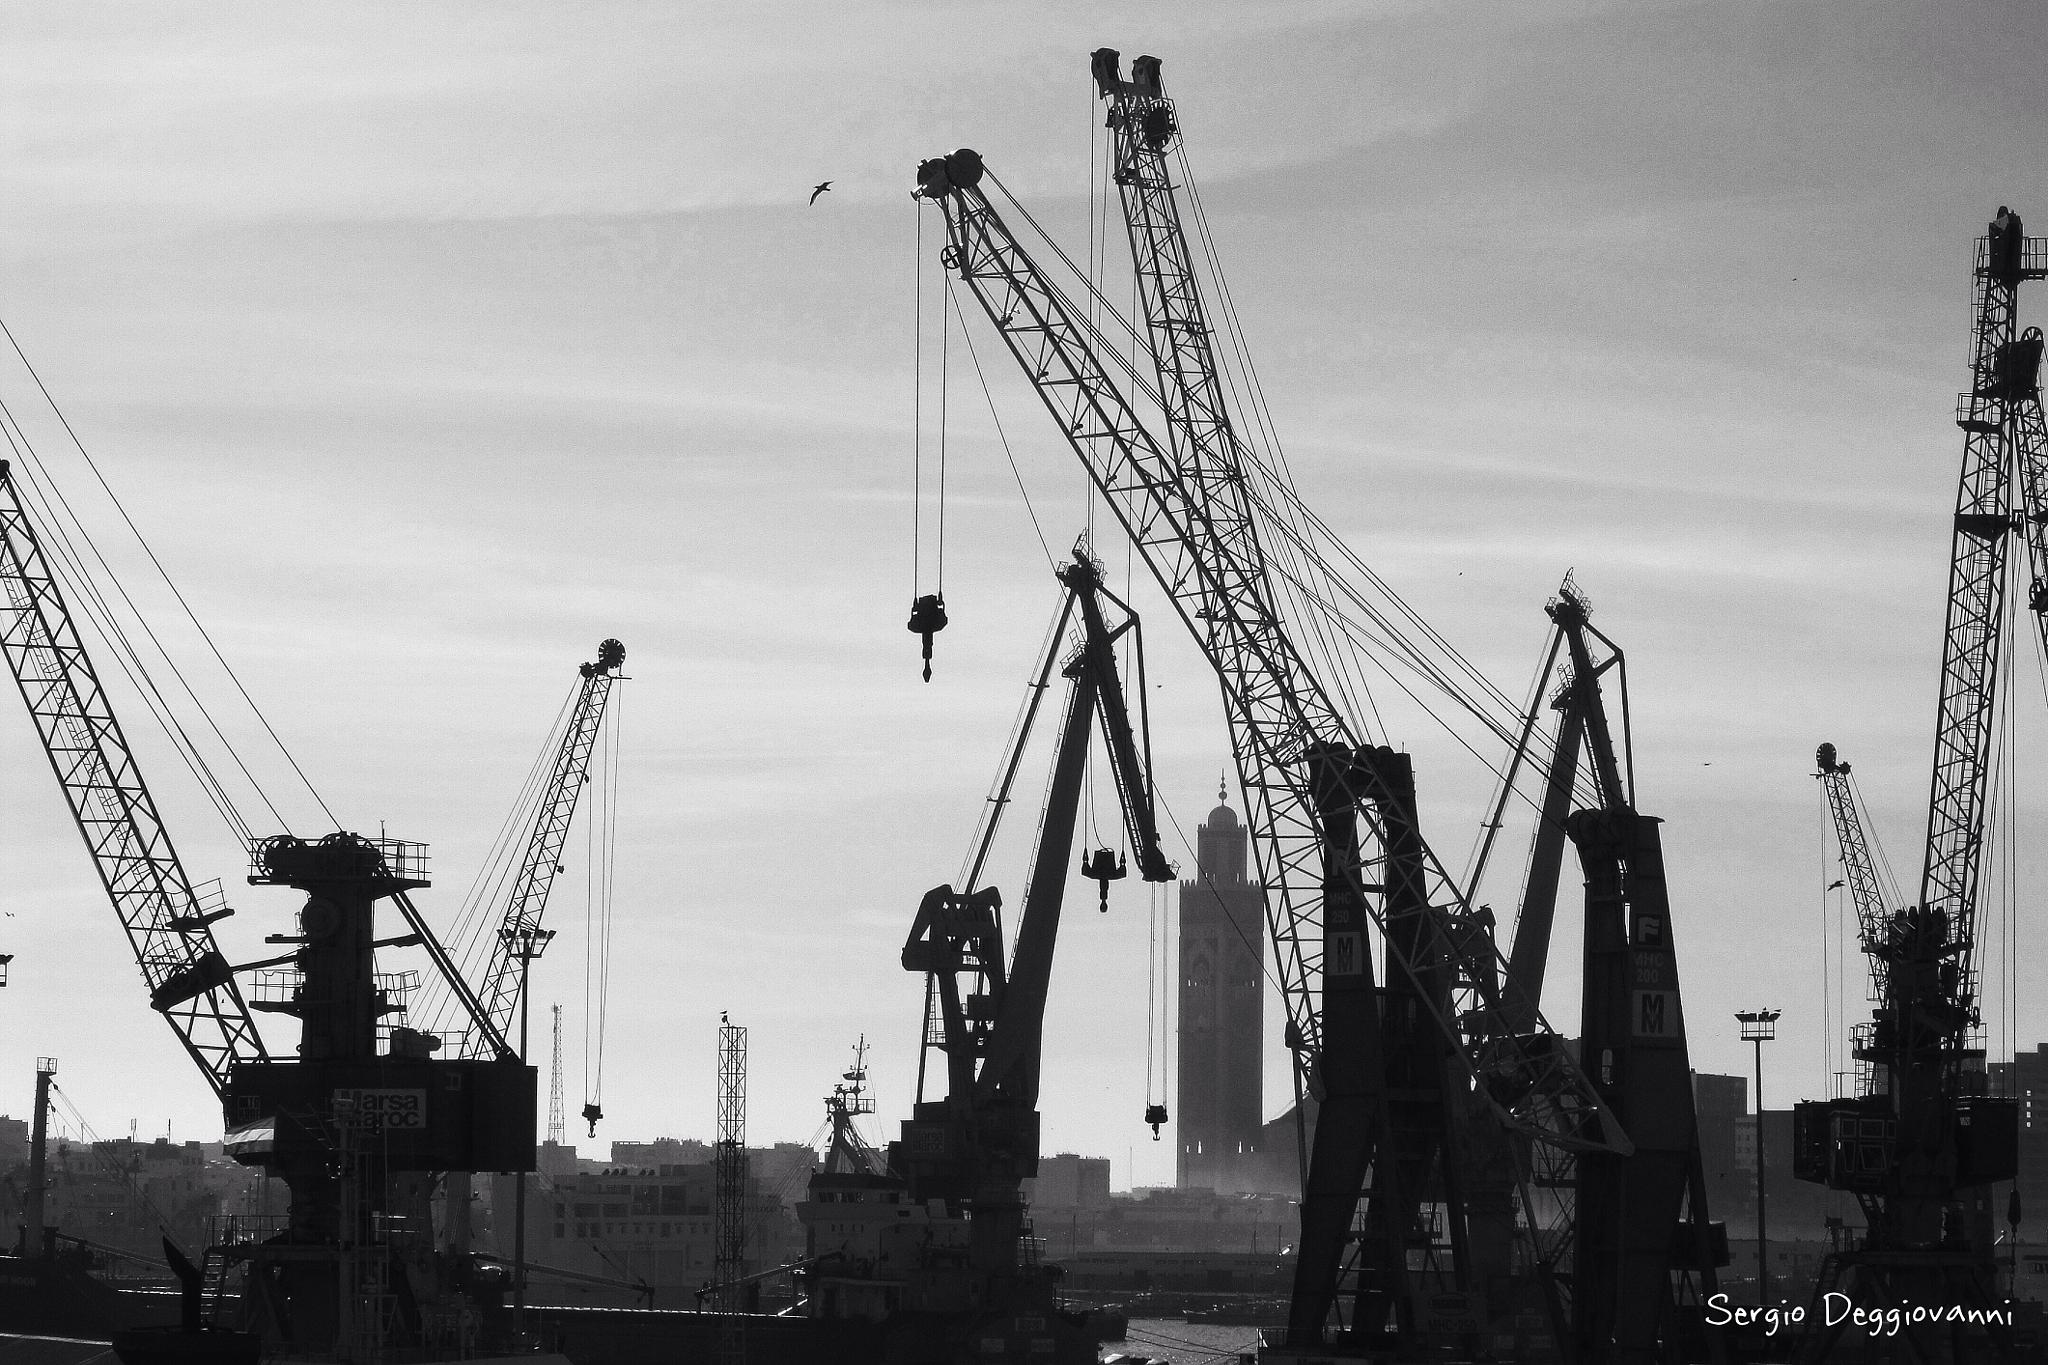 Dans le port de Casablanca by Sergio Deggiovanni